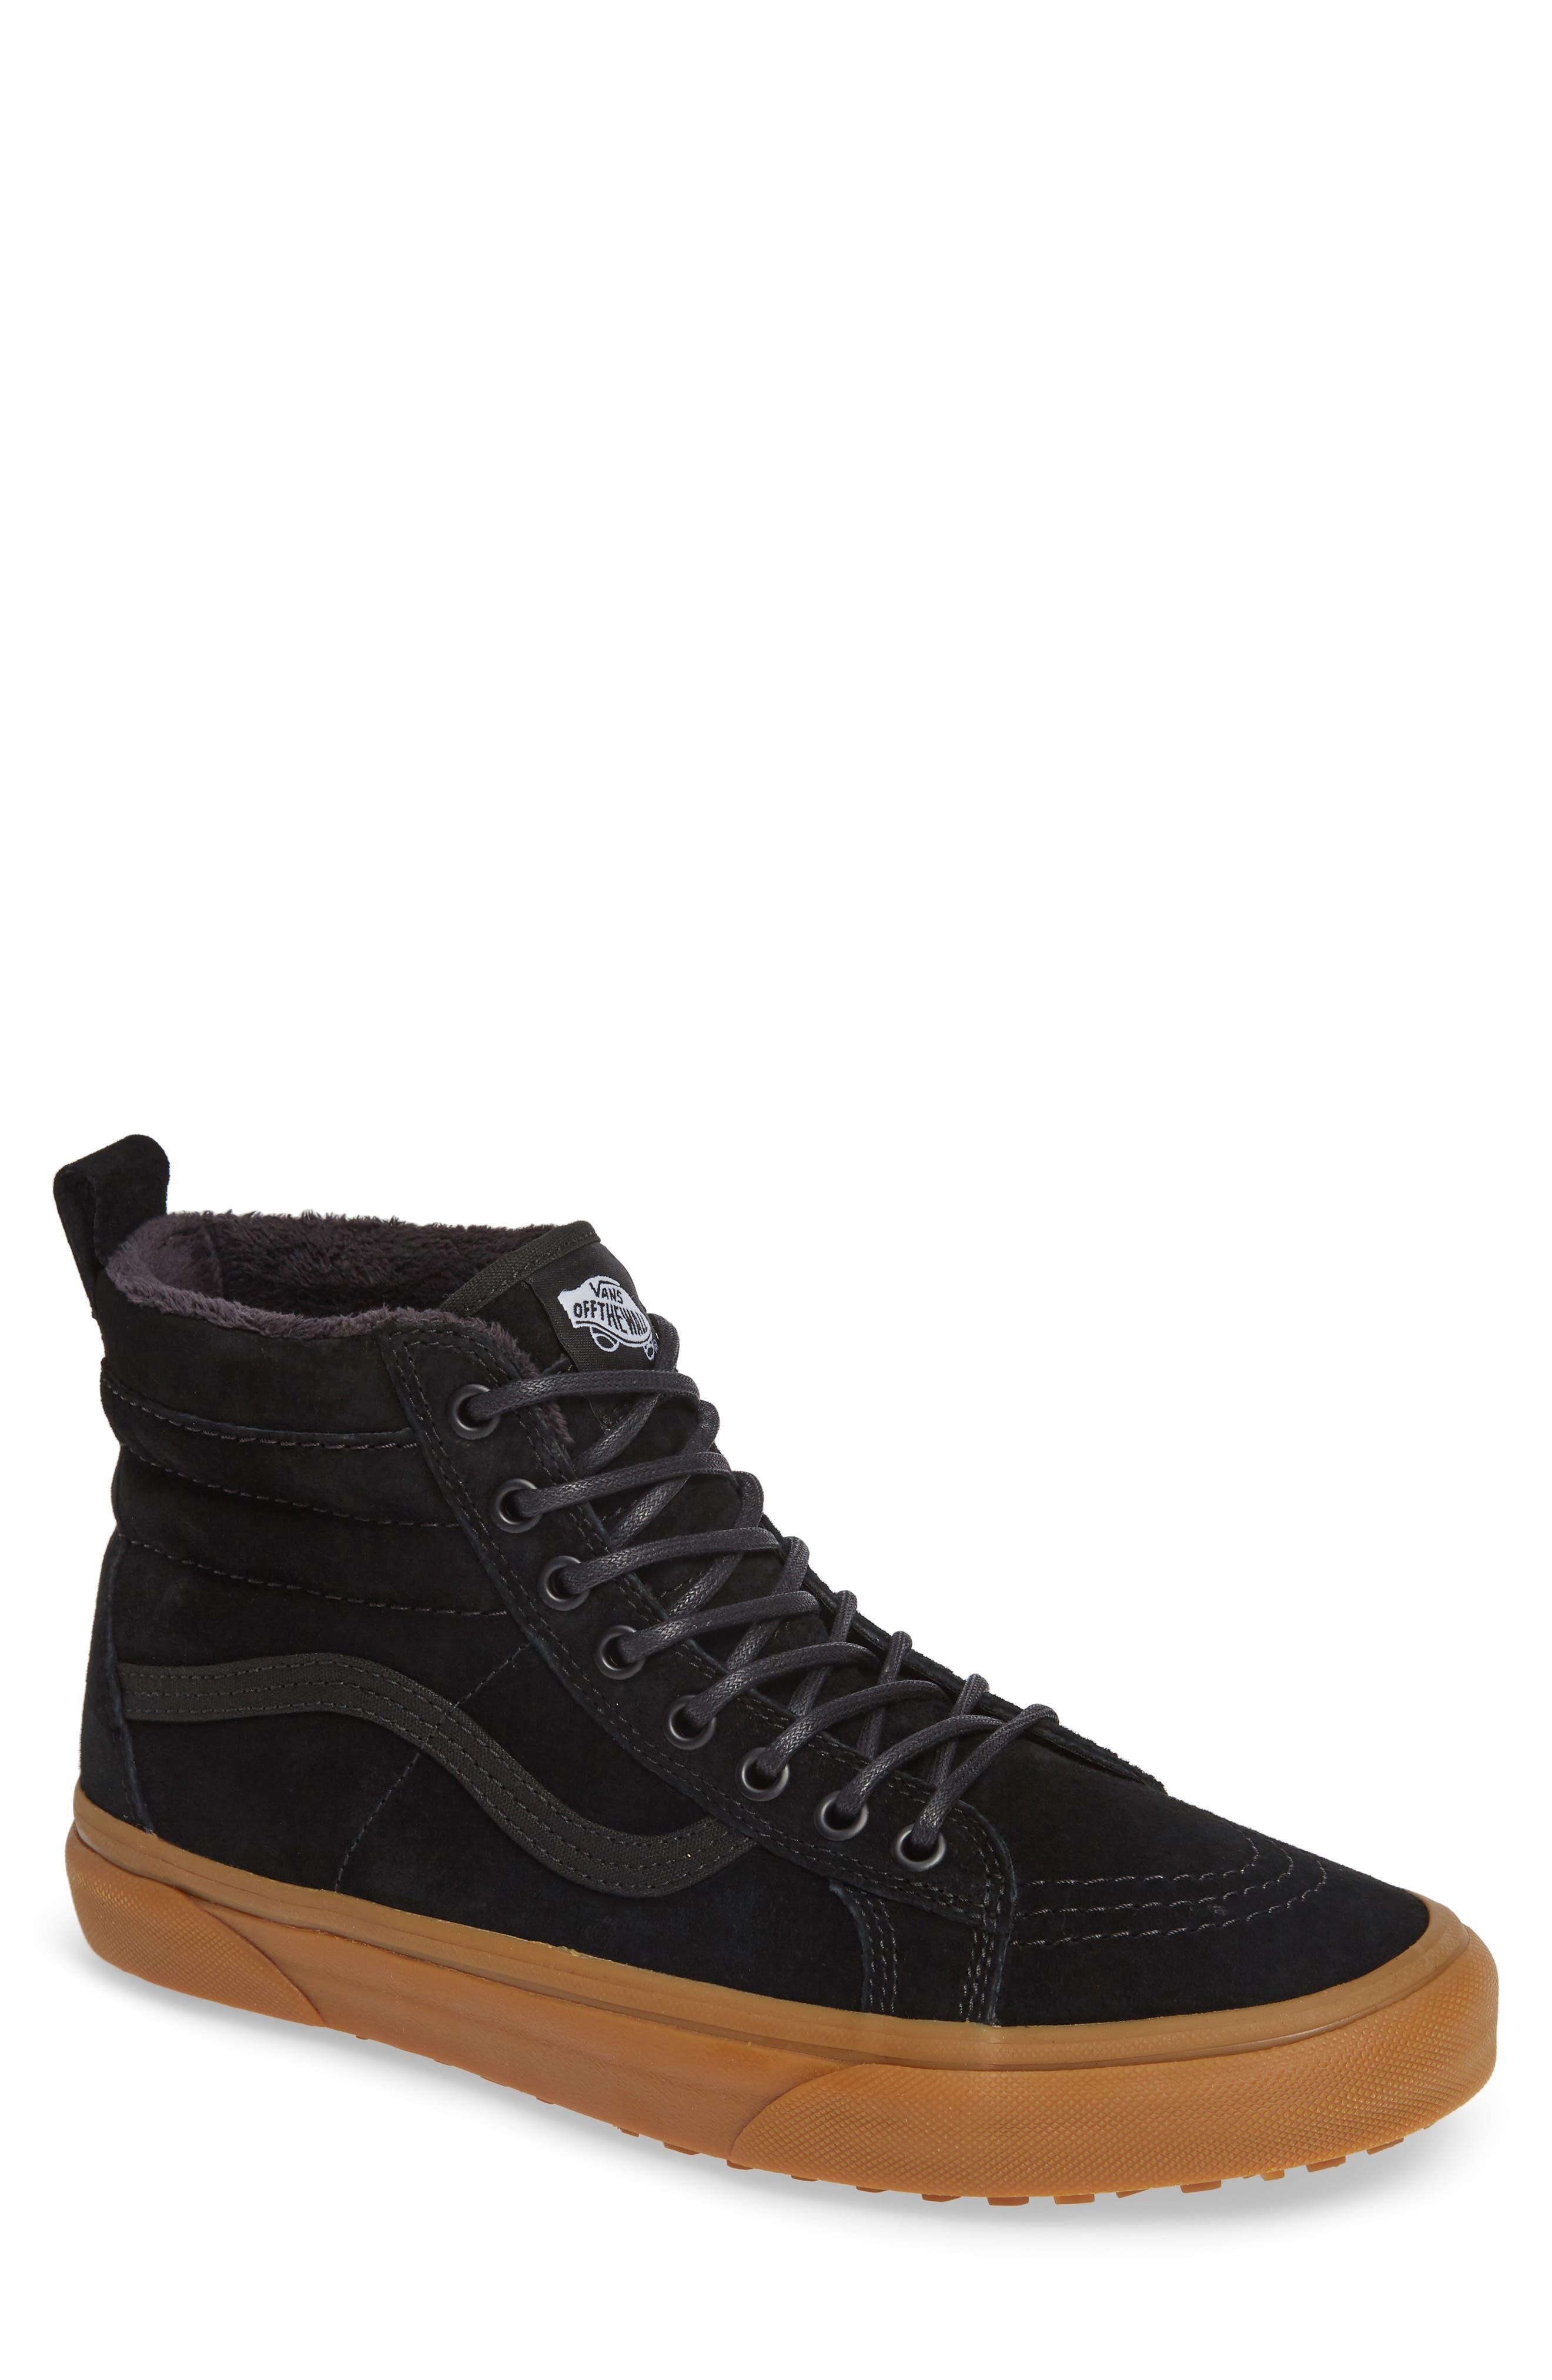 'Sk8-Hi MTE' Sneaker,                             Main thumbnail 1, color,                             BLACK/ GUM